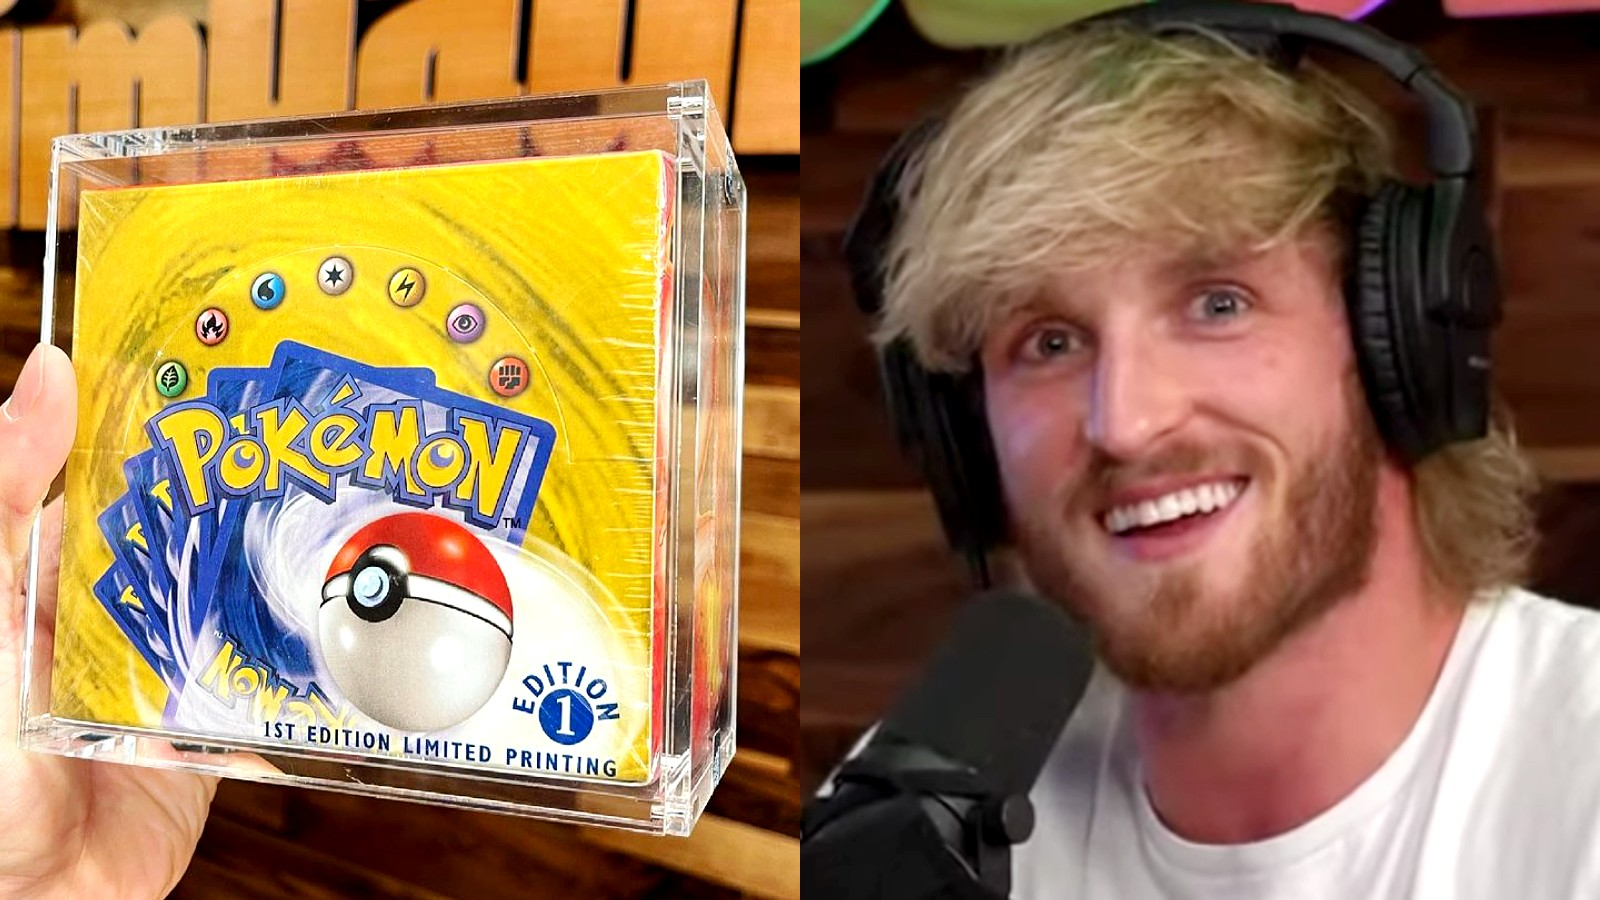 Logan Paul next to Pokemon card box